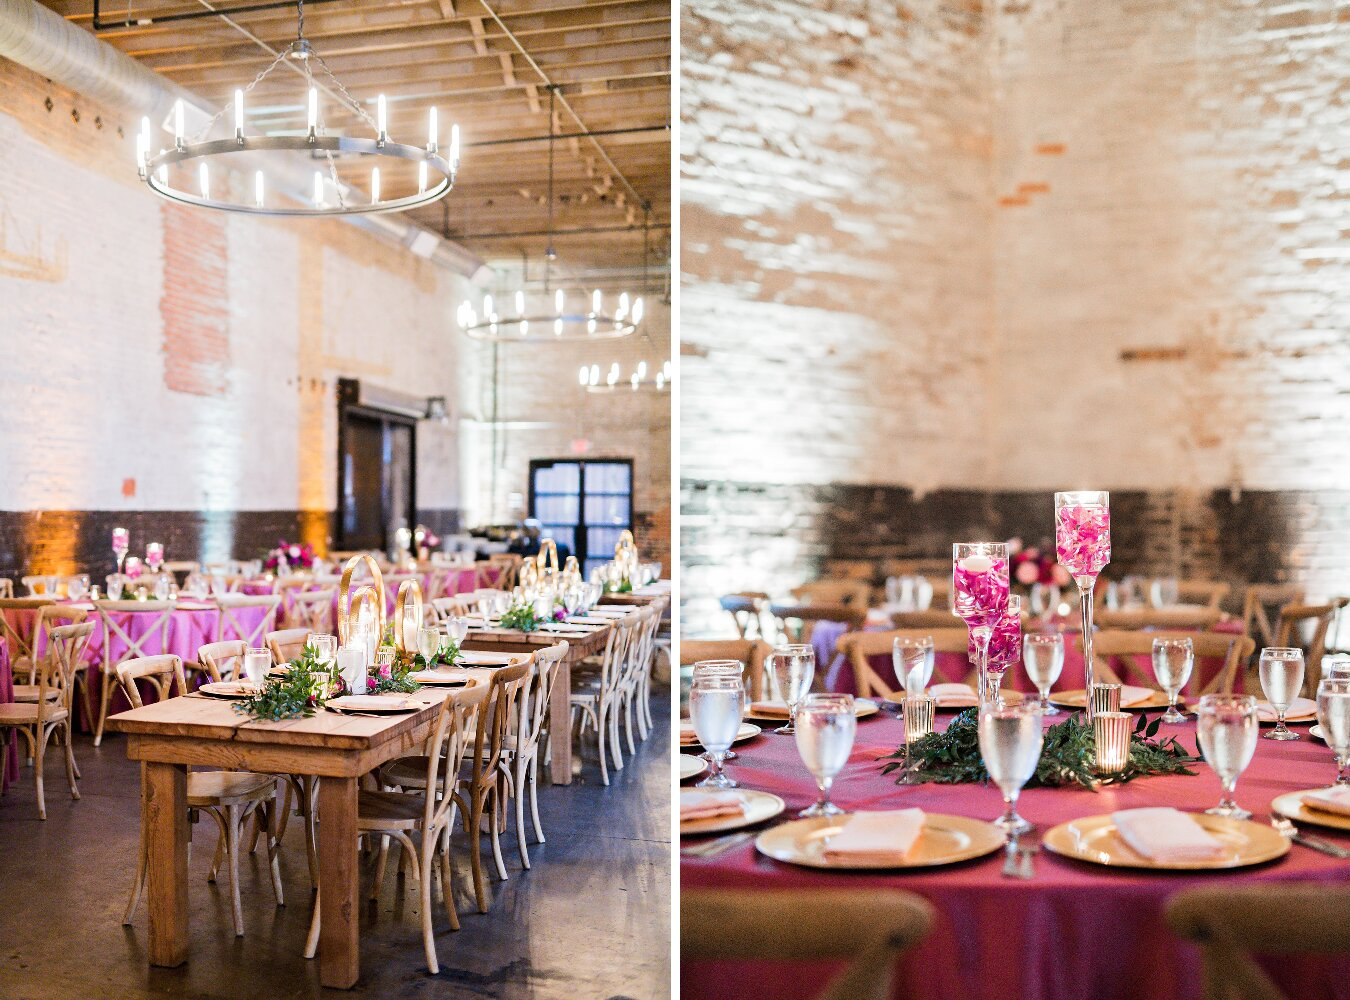 Dallas Wedding- Pharris Photography- Reception- Sophie + Kellen- Reception Room- Tablescape- Table Decor